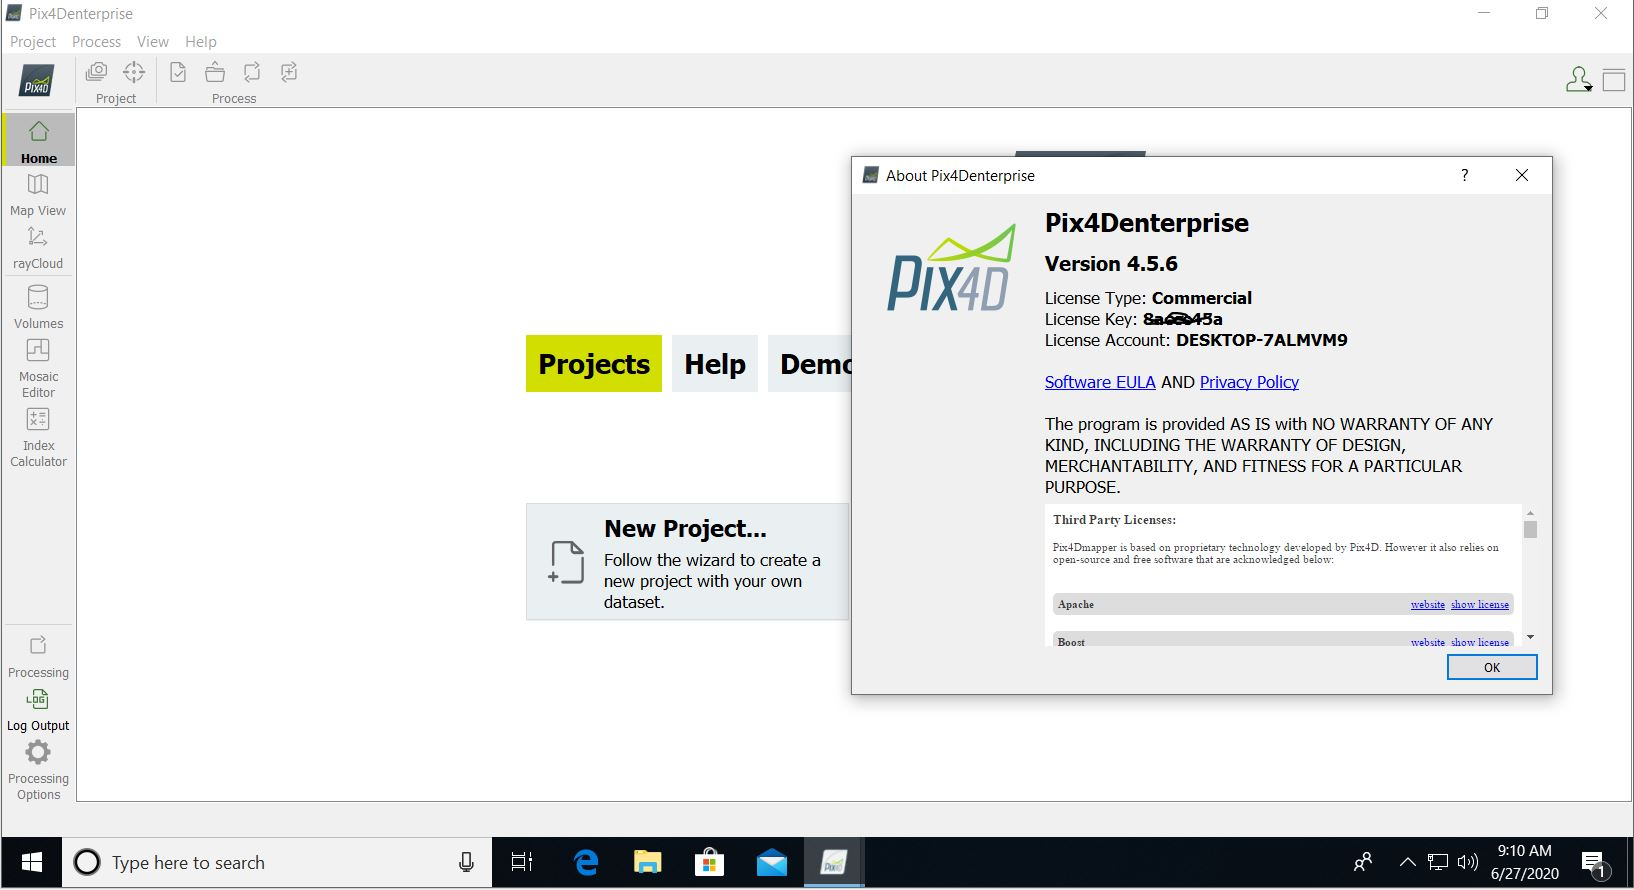 Working with Pix4Dmapper Enterprise 4.5.6 full license